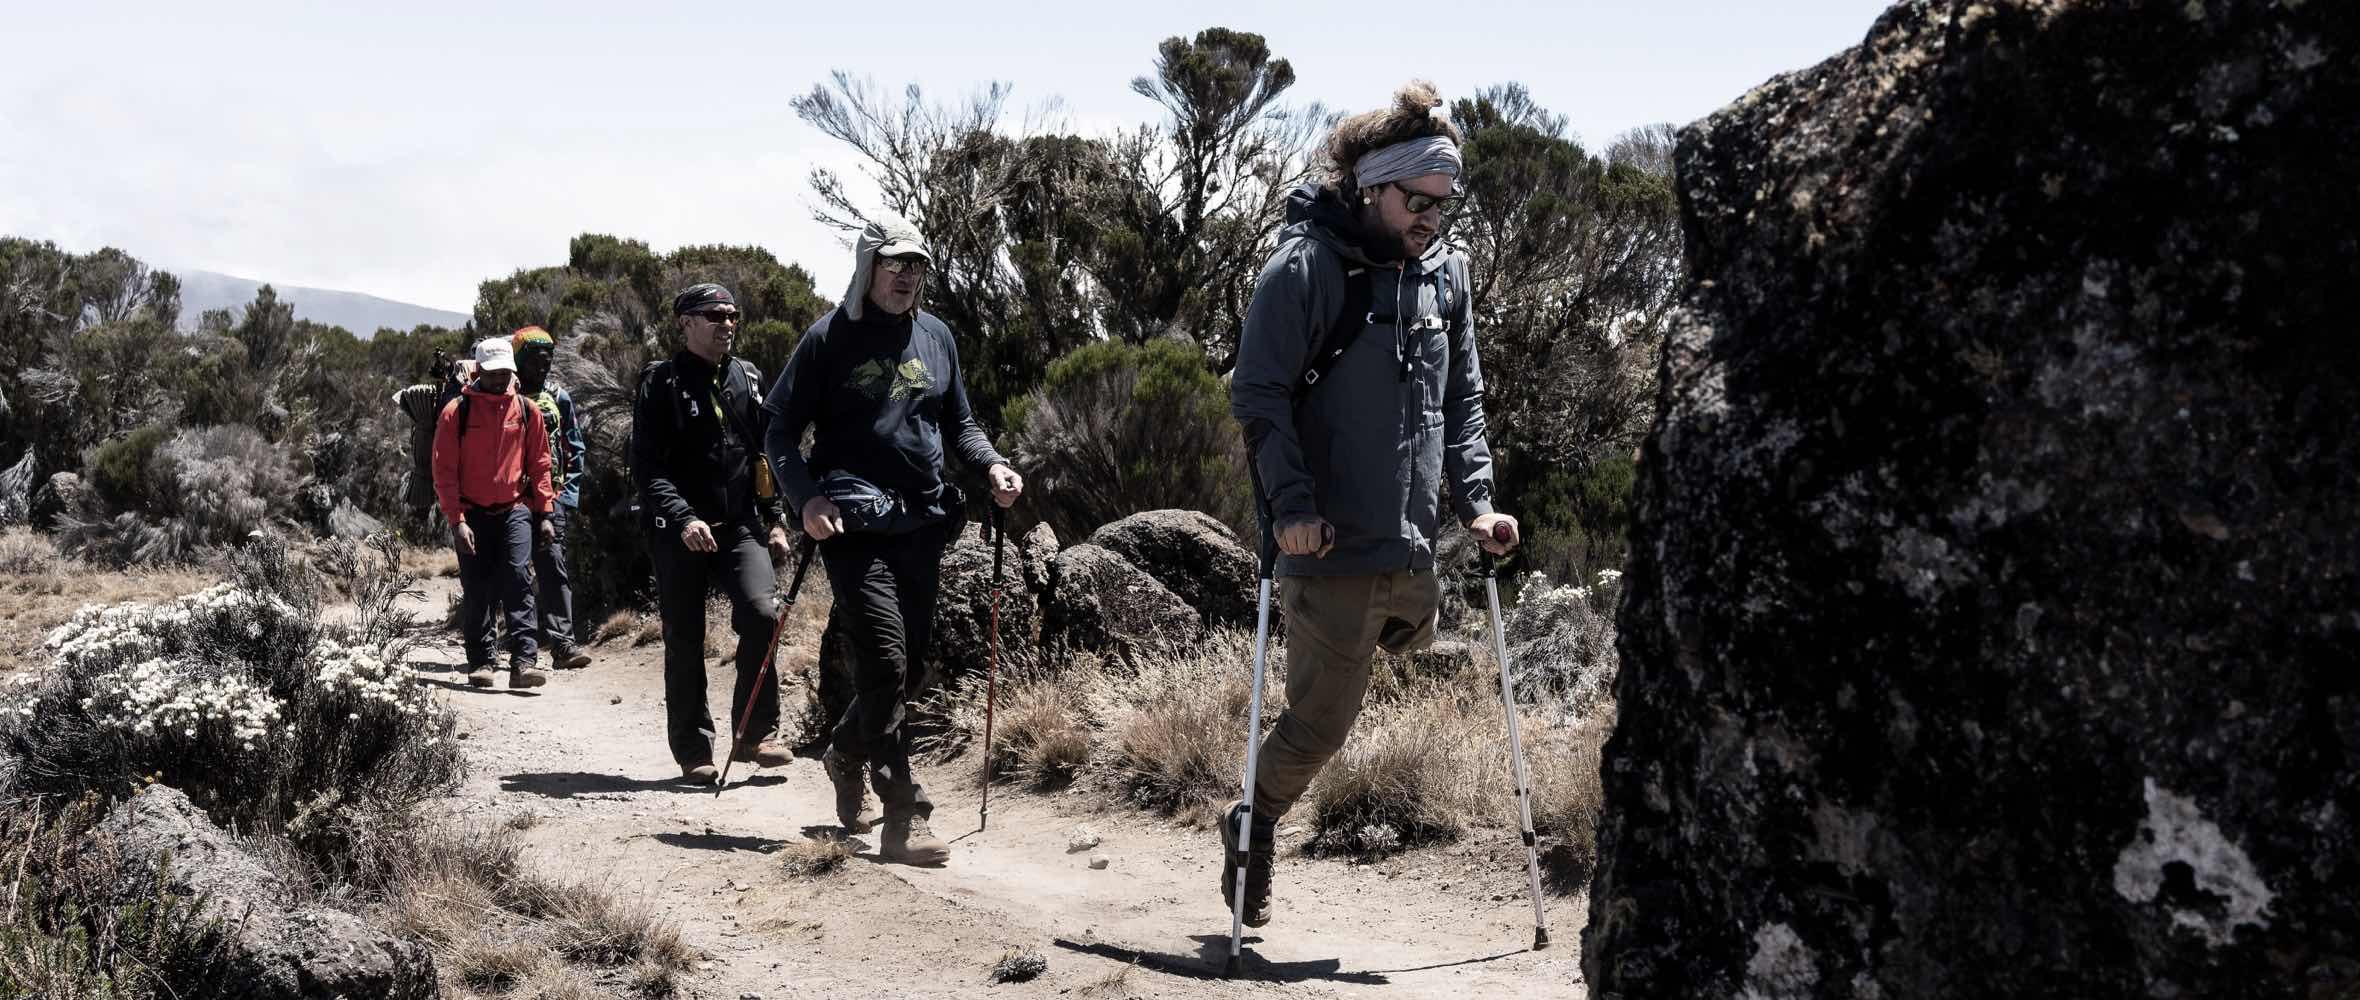 activity_hiking_s19_slider_4-6815-0